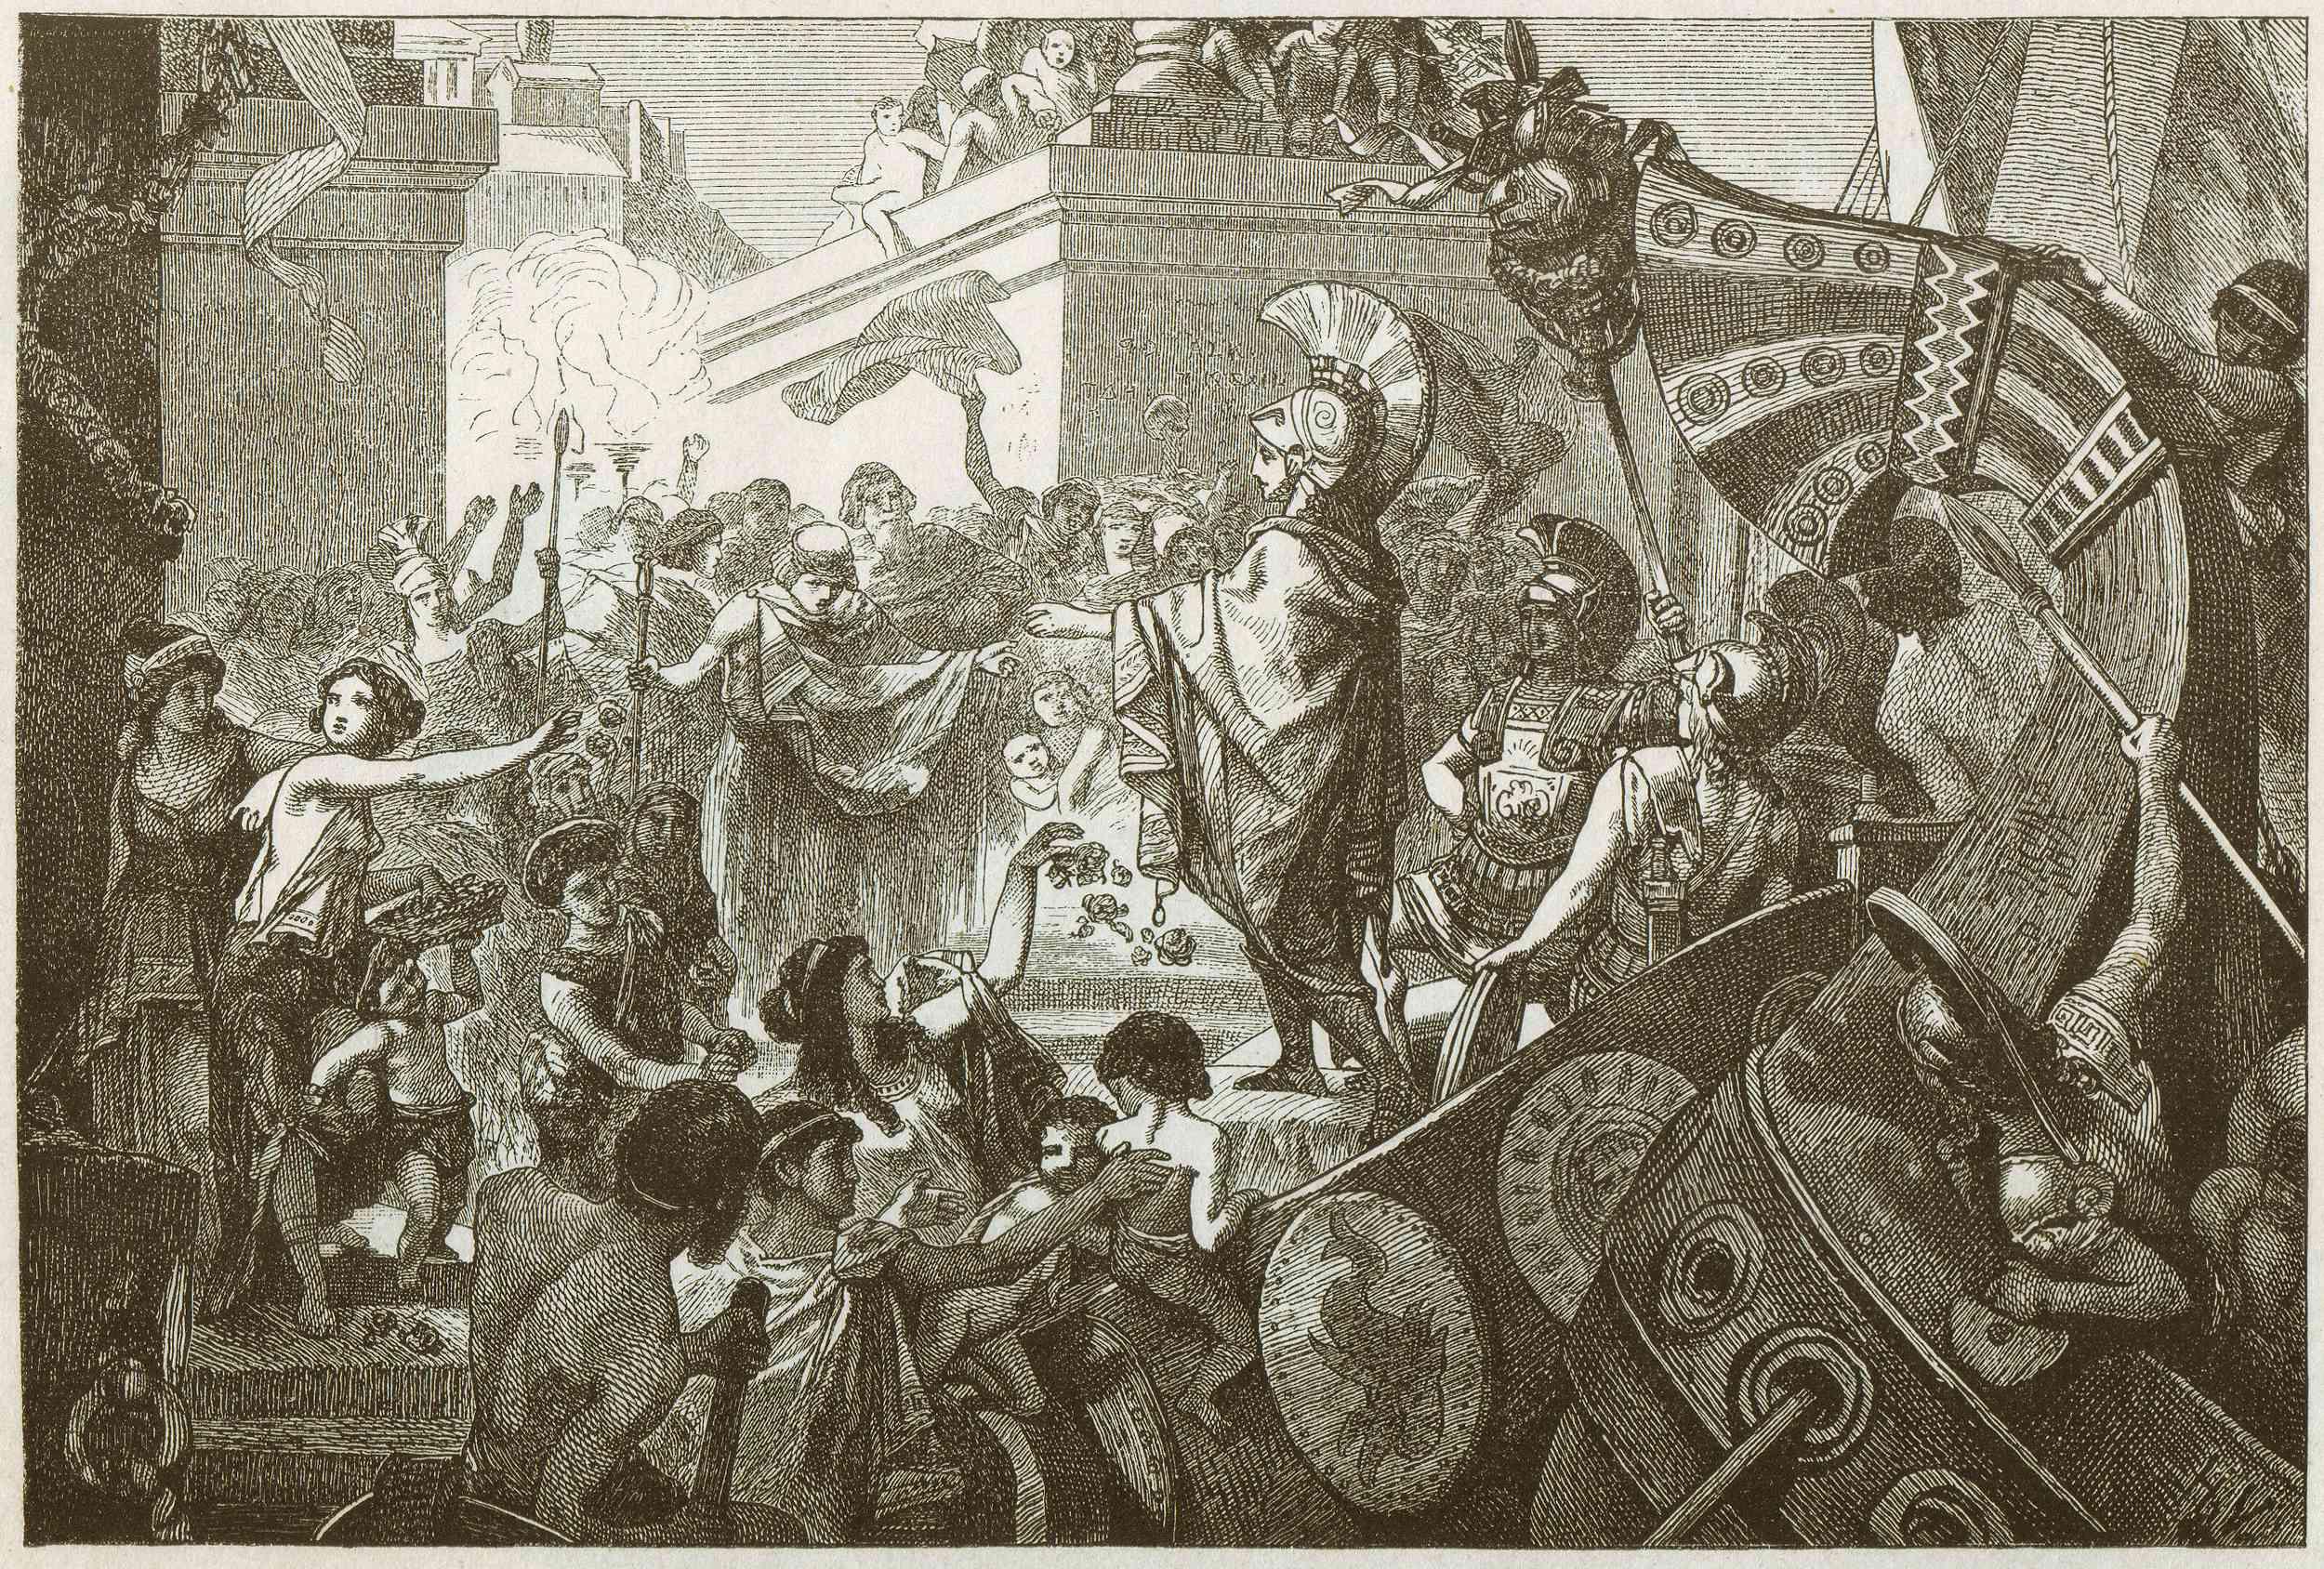 Alcibiades return to Athens (408 BCE)